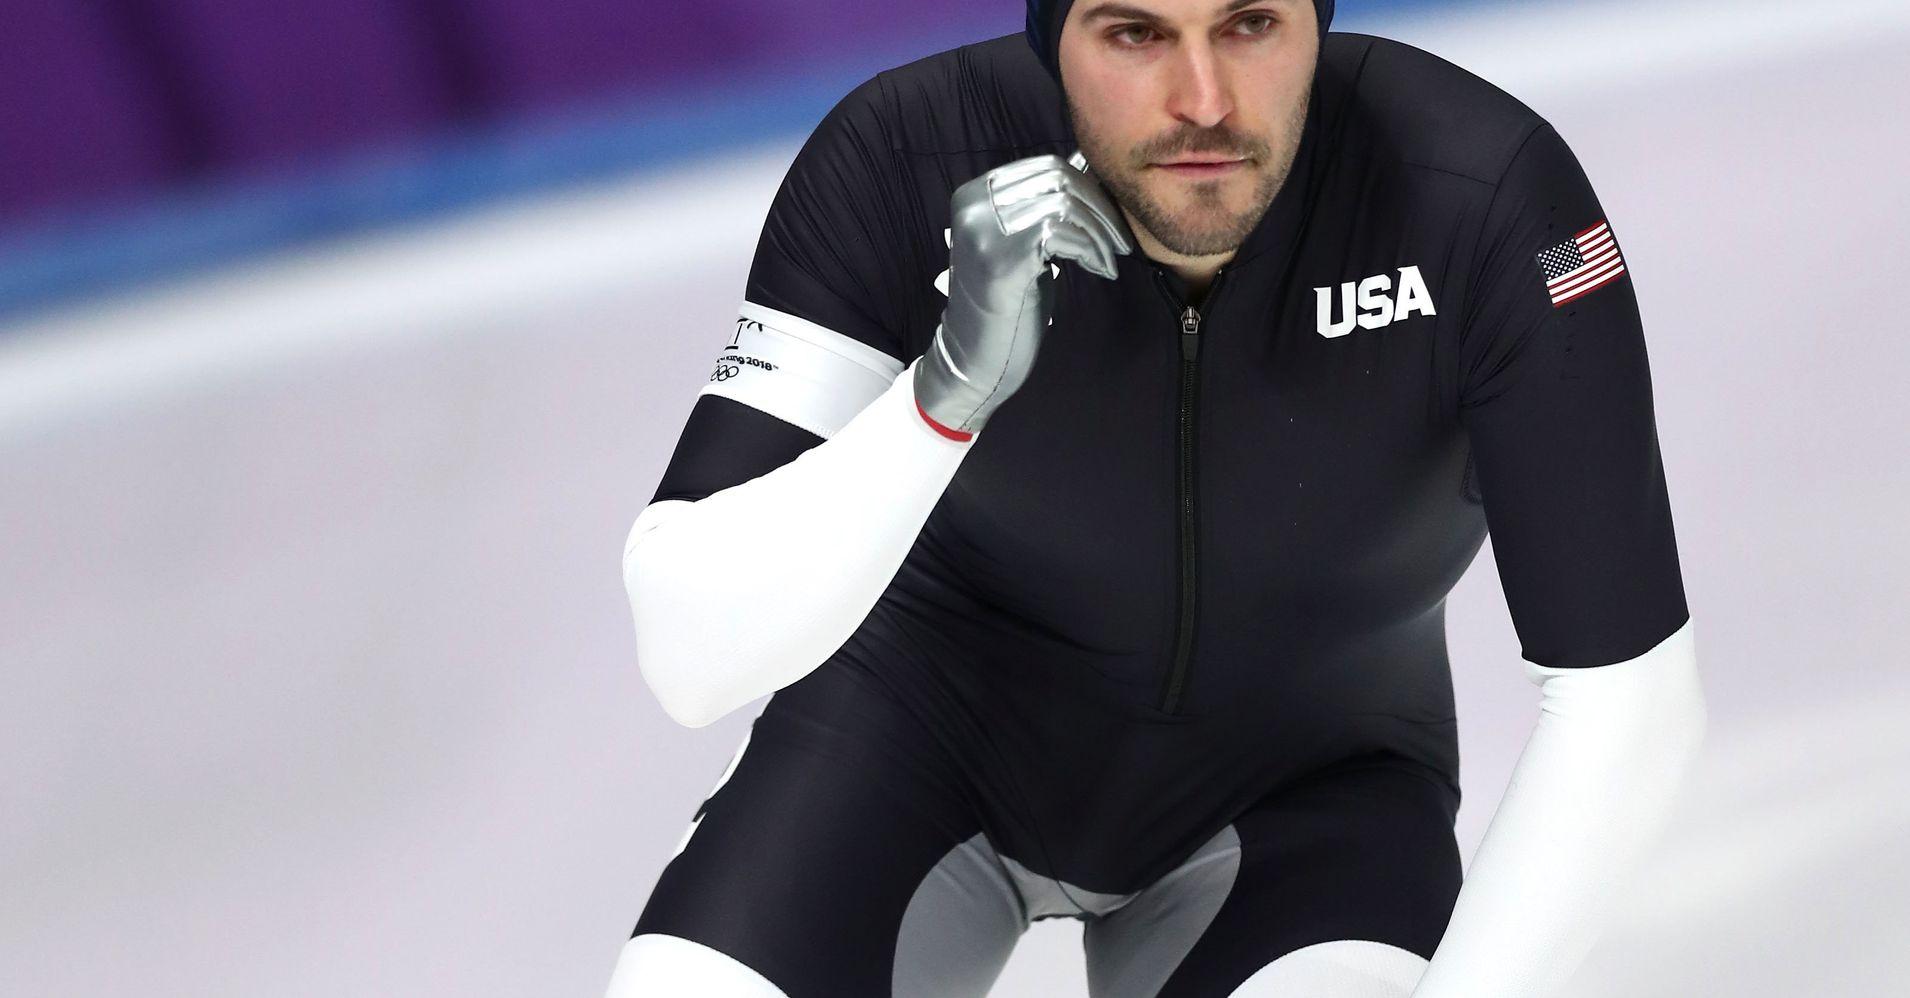 Team USAu0026#39;s u0026#39;Crotch Patchu0026#39; Speed Skating Uniforms Get Ribbed Online | HuffPost